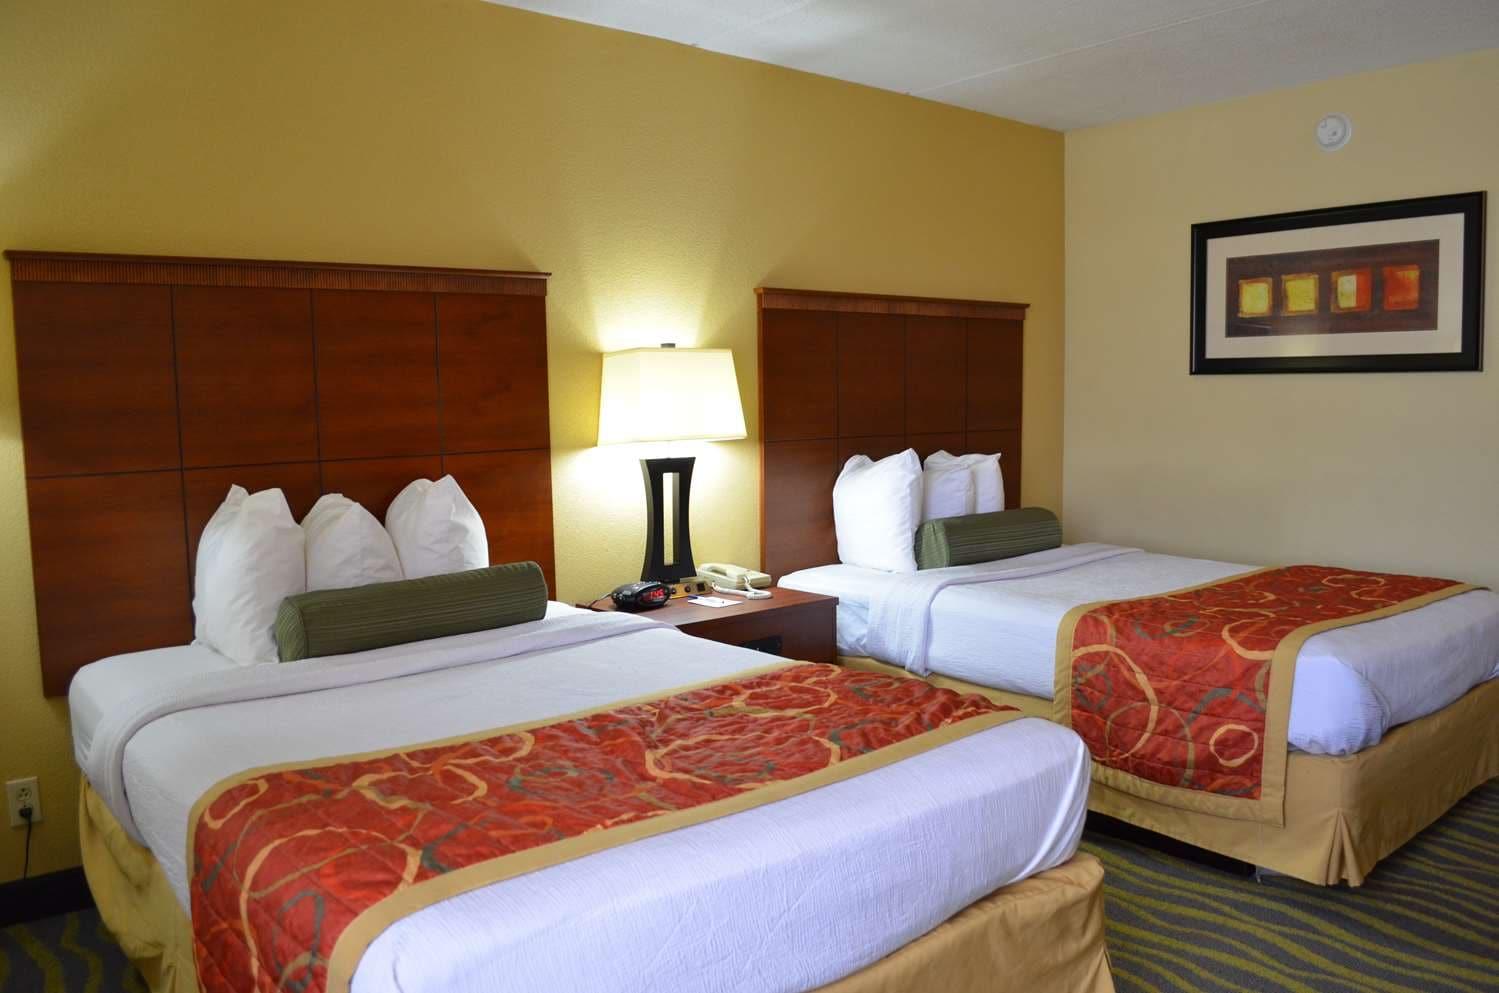 Hotels In Uptown Charlotte, NC - Best Western Plus Matthews